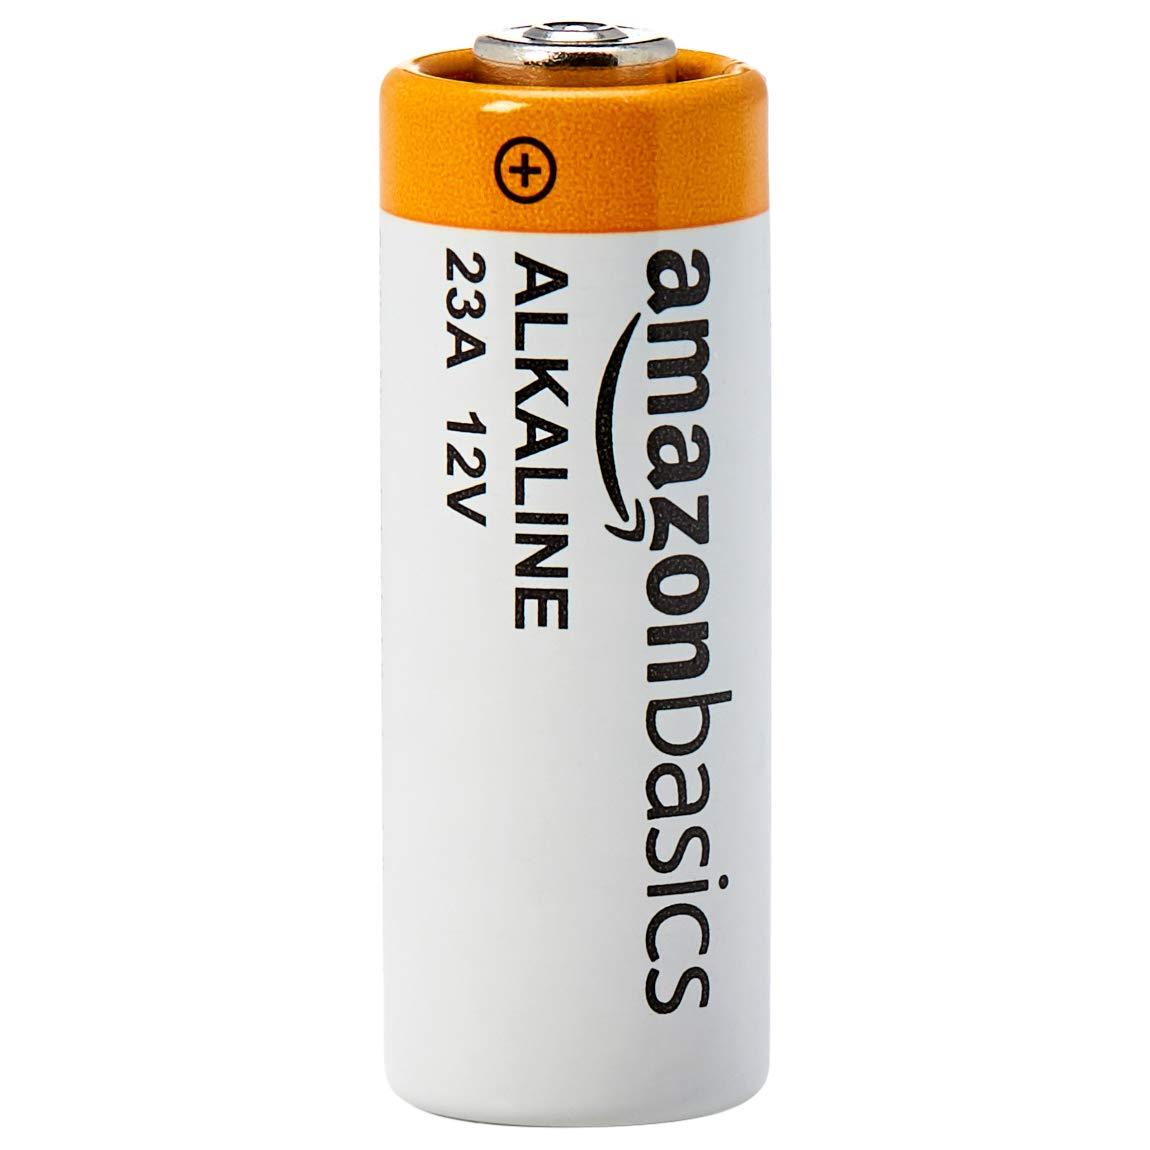 AmazonBasics 23A Alkaline Battery - Pack of 4